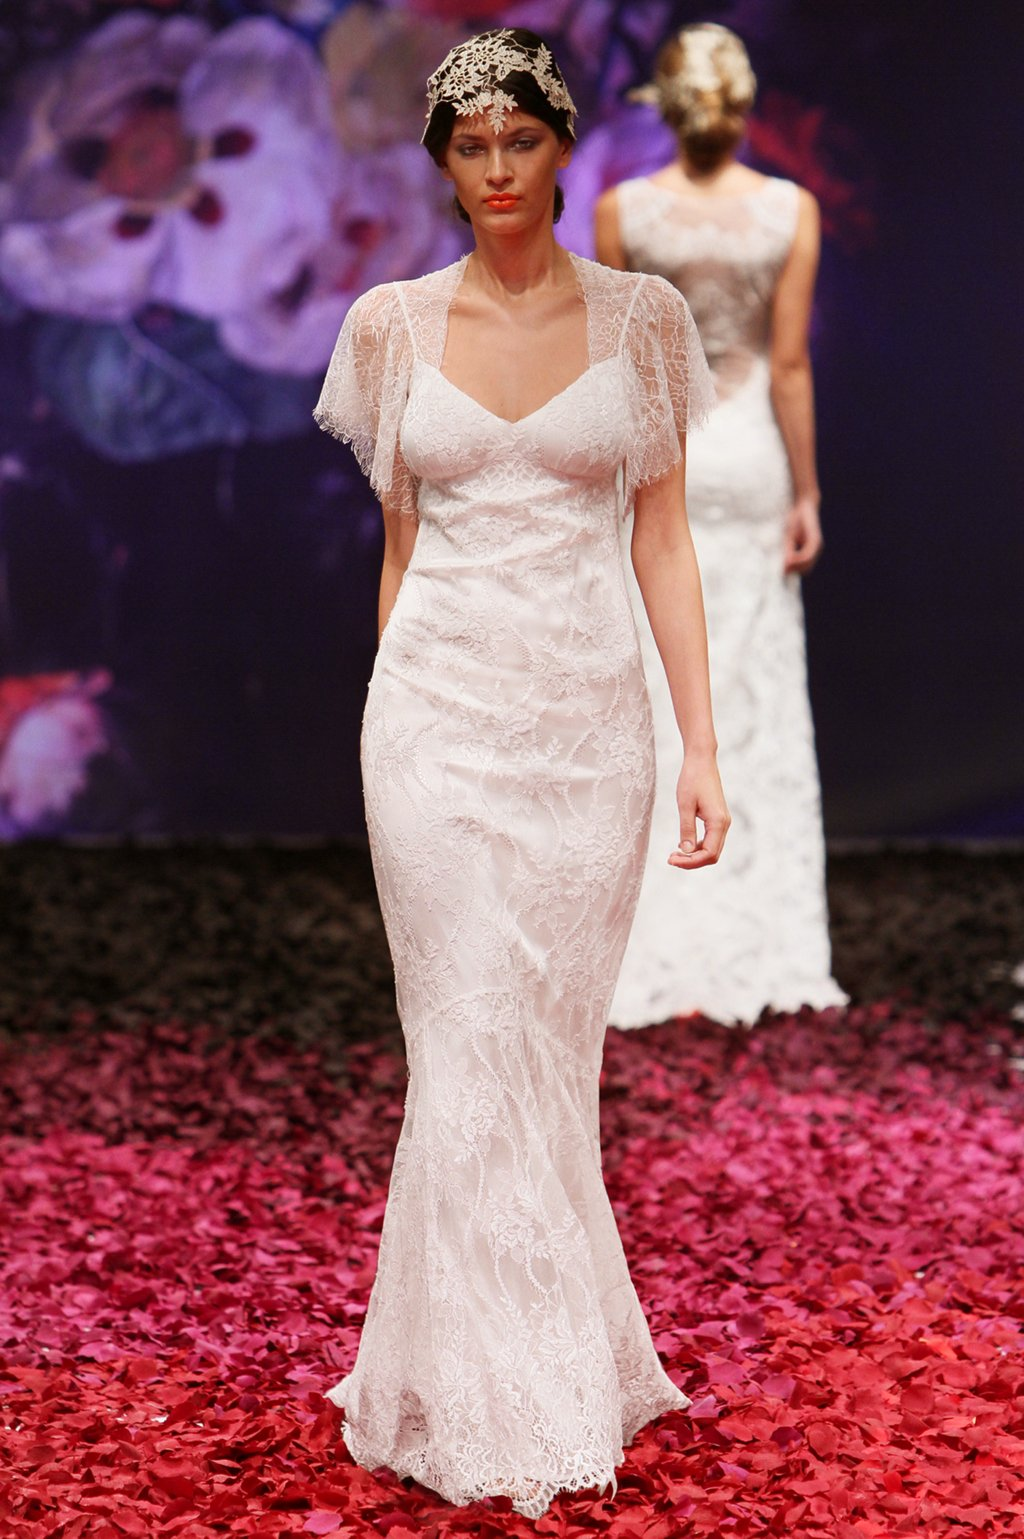 Juniper-wedding-dress-by-claire-pettibone-2014-still-life-bridal-collection.full